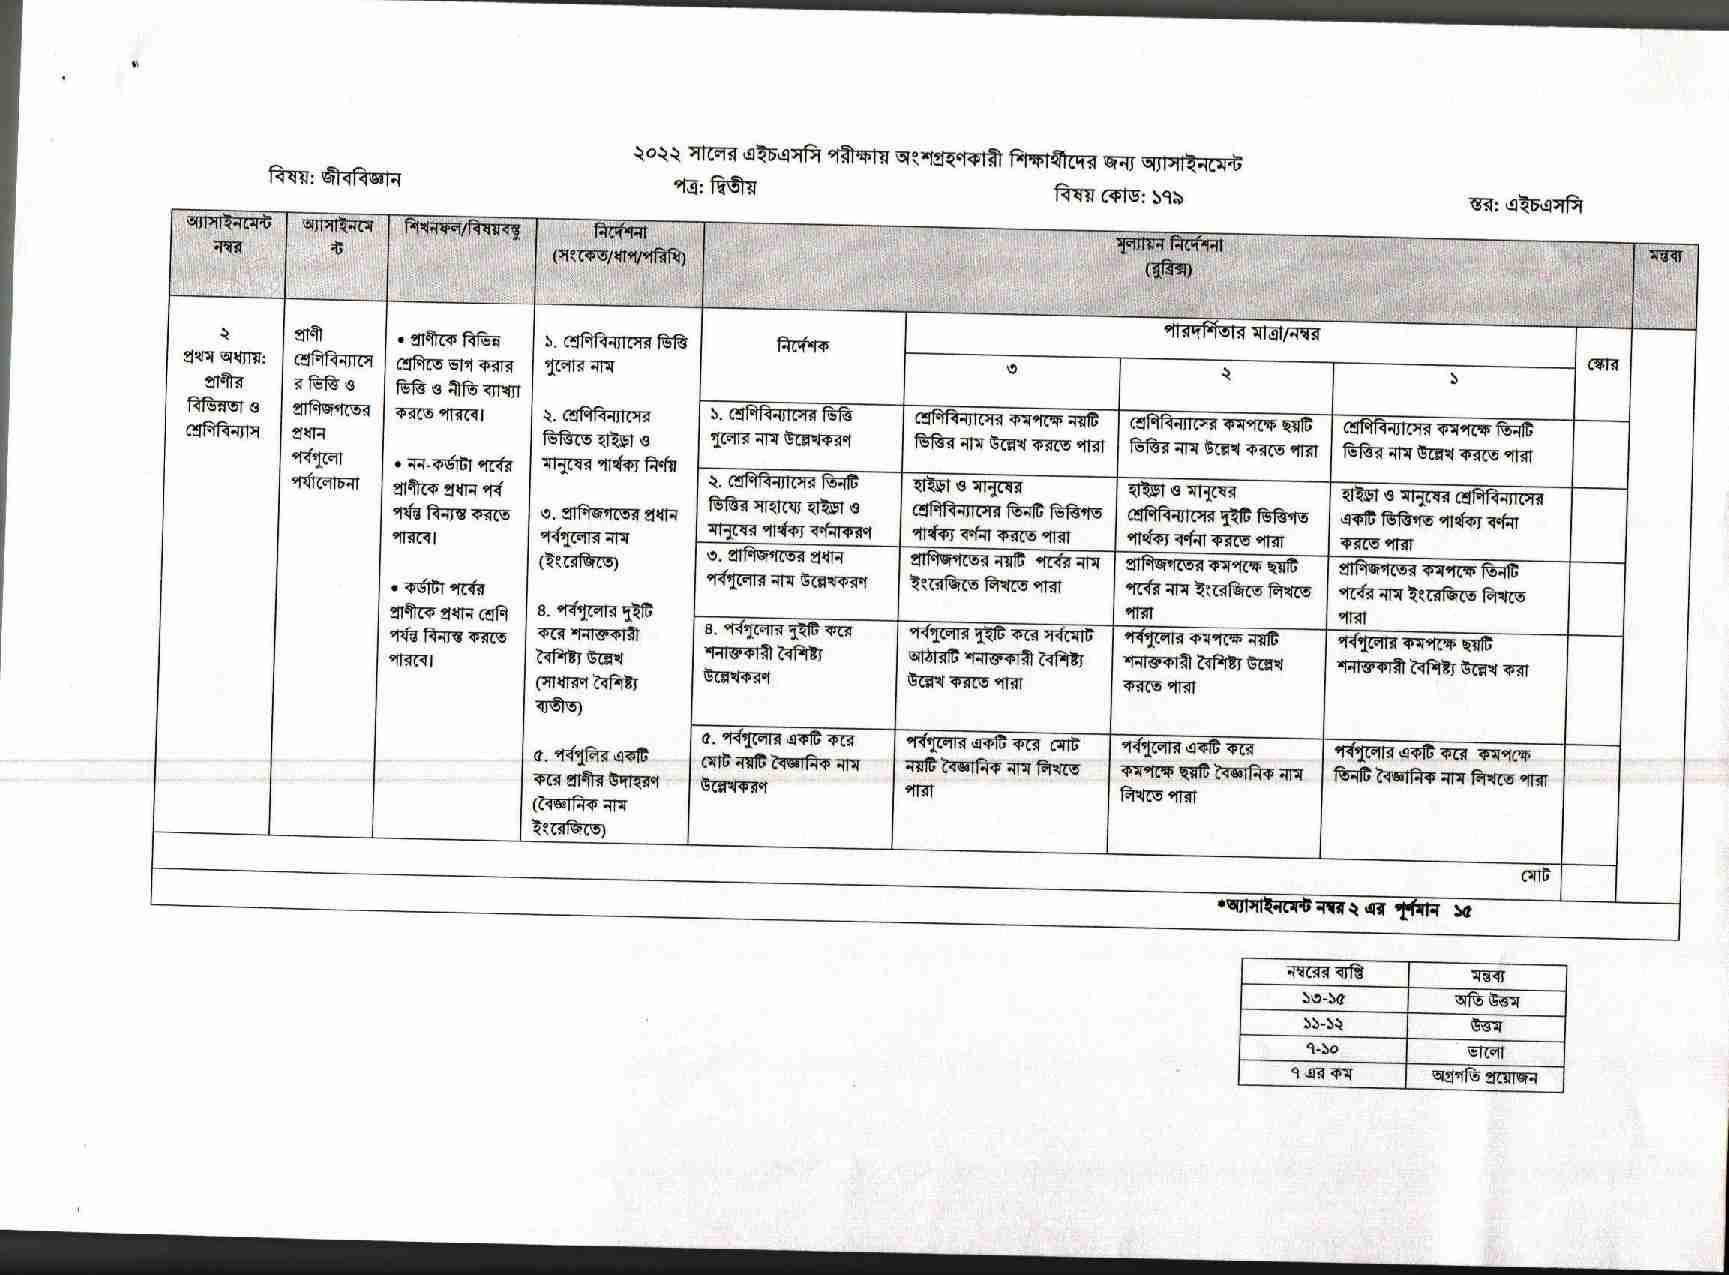 HSC Biology 8th week Assignment Answer 2022